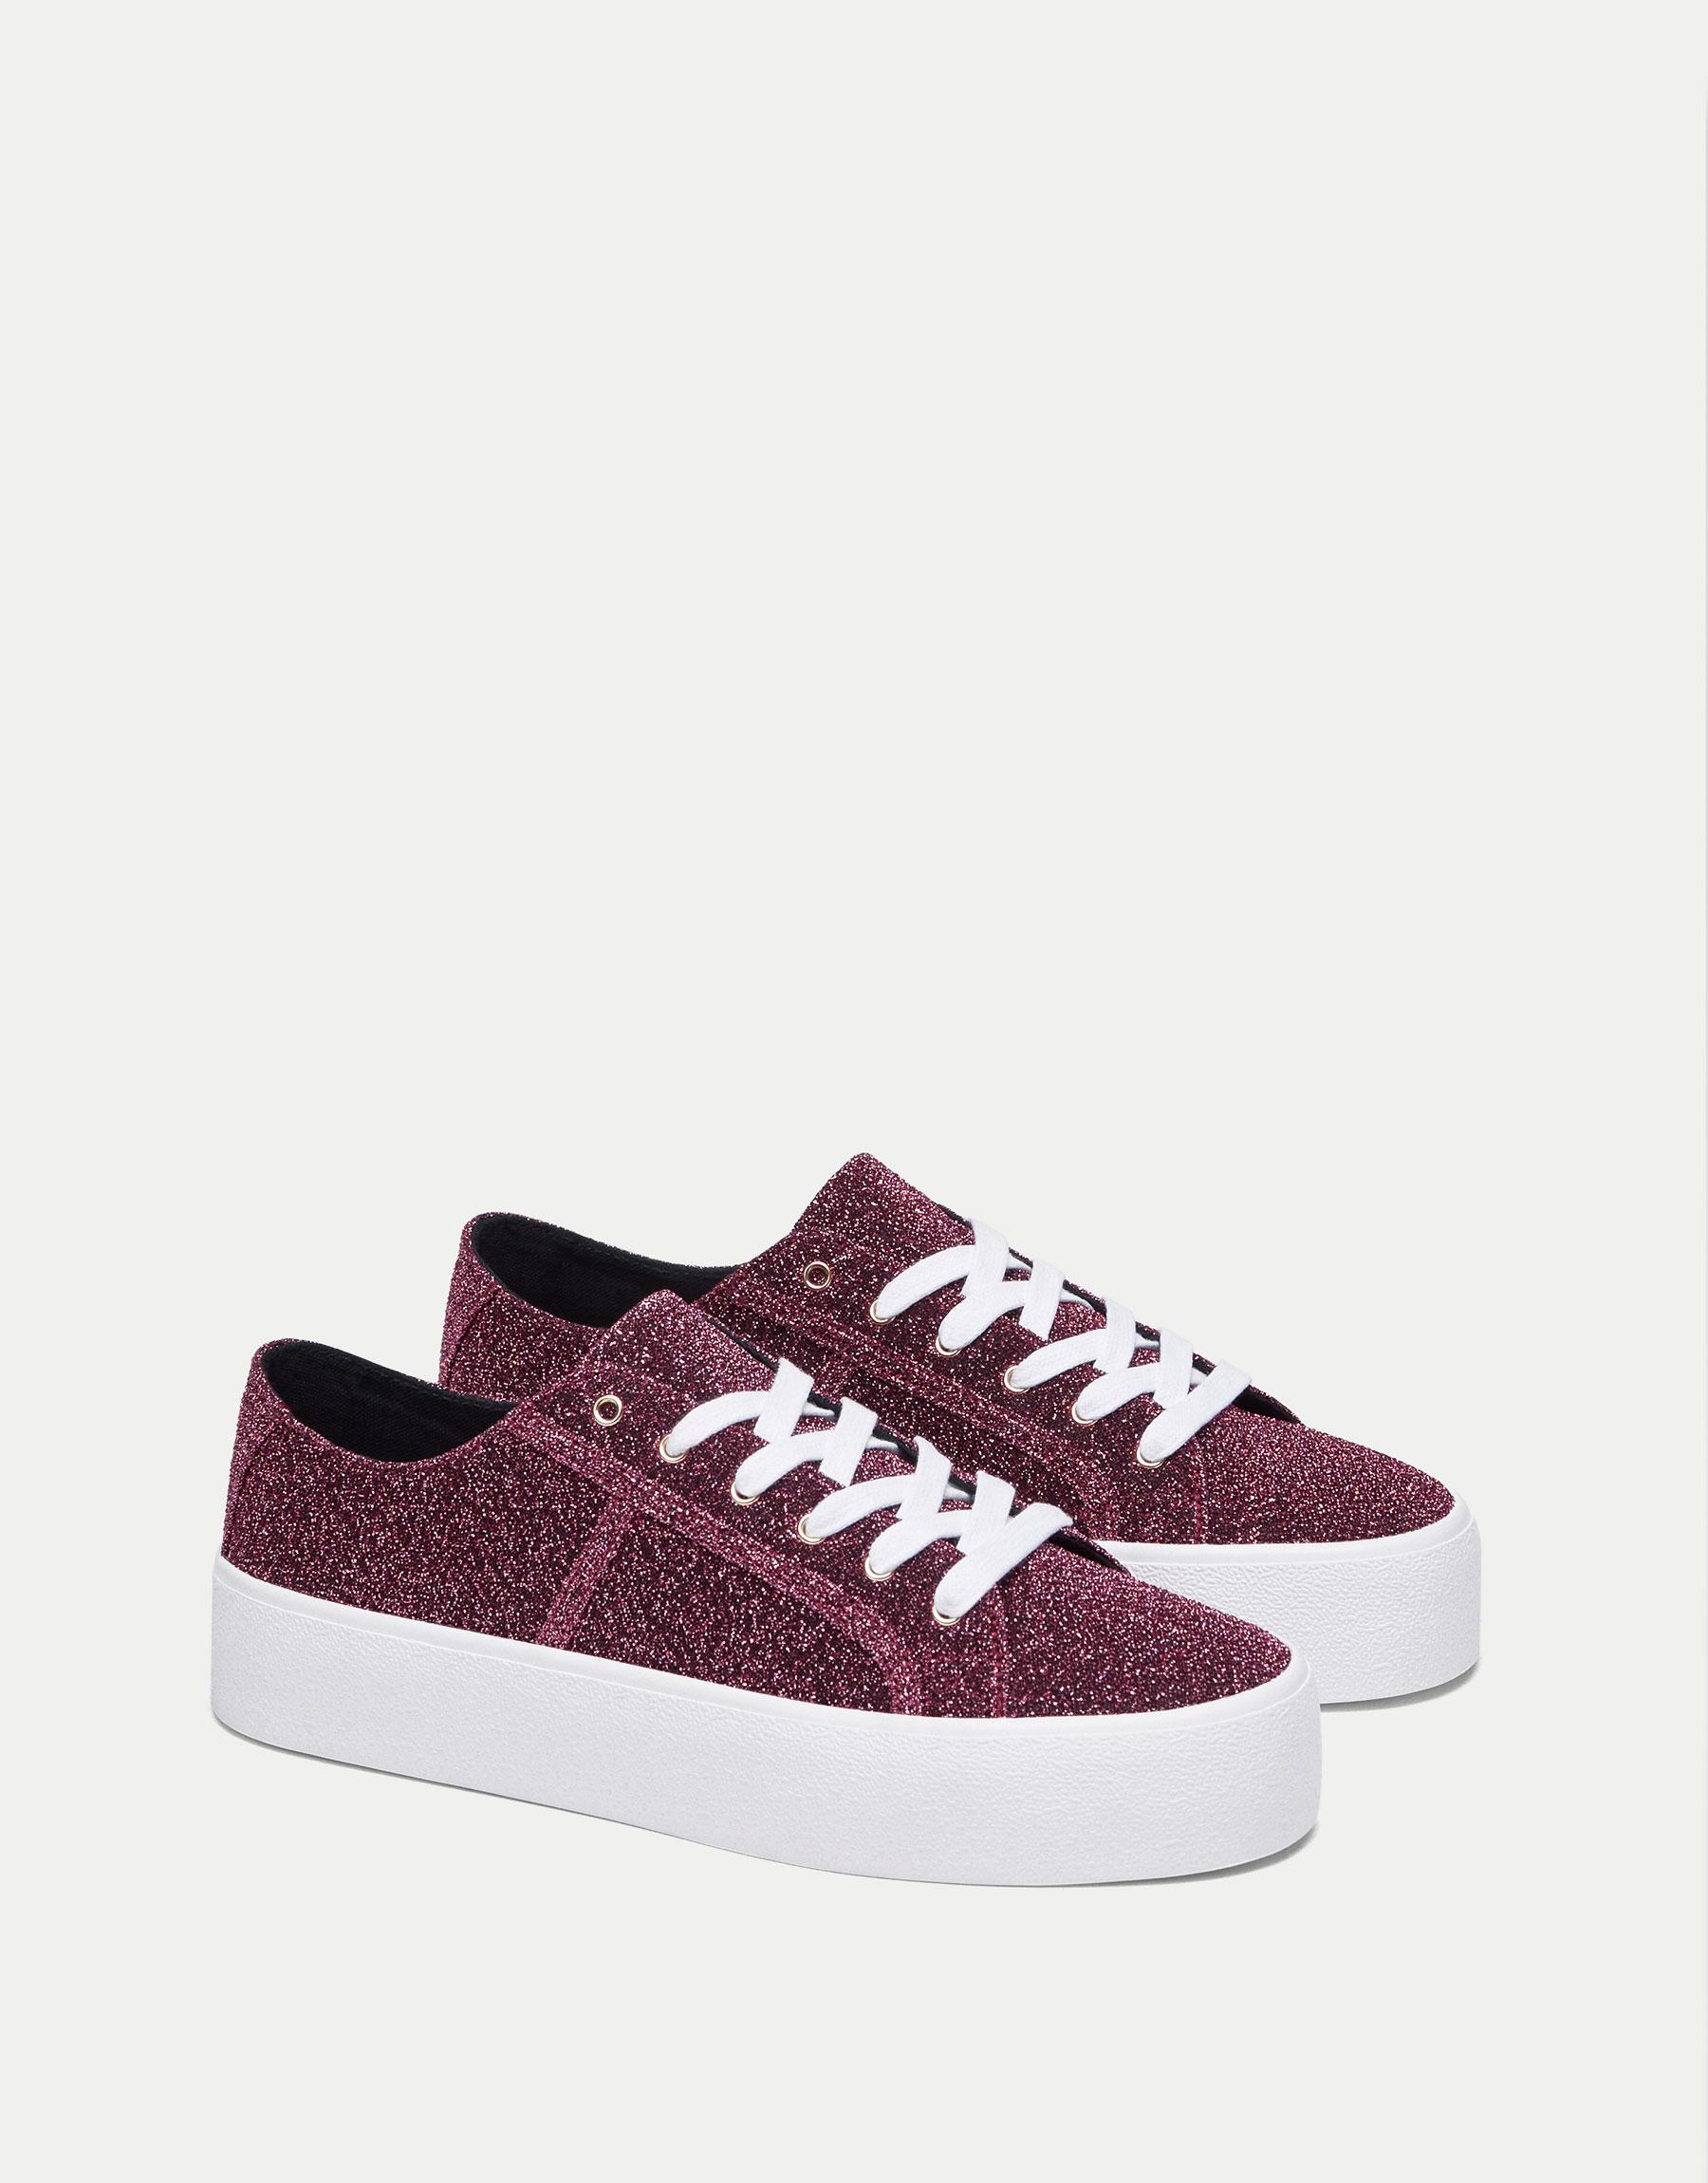 Shiny sneaker